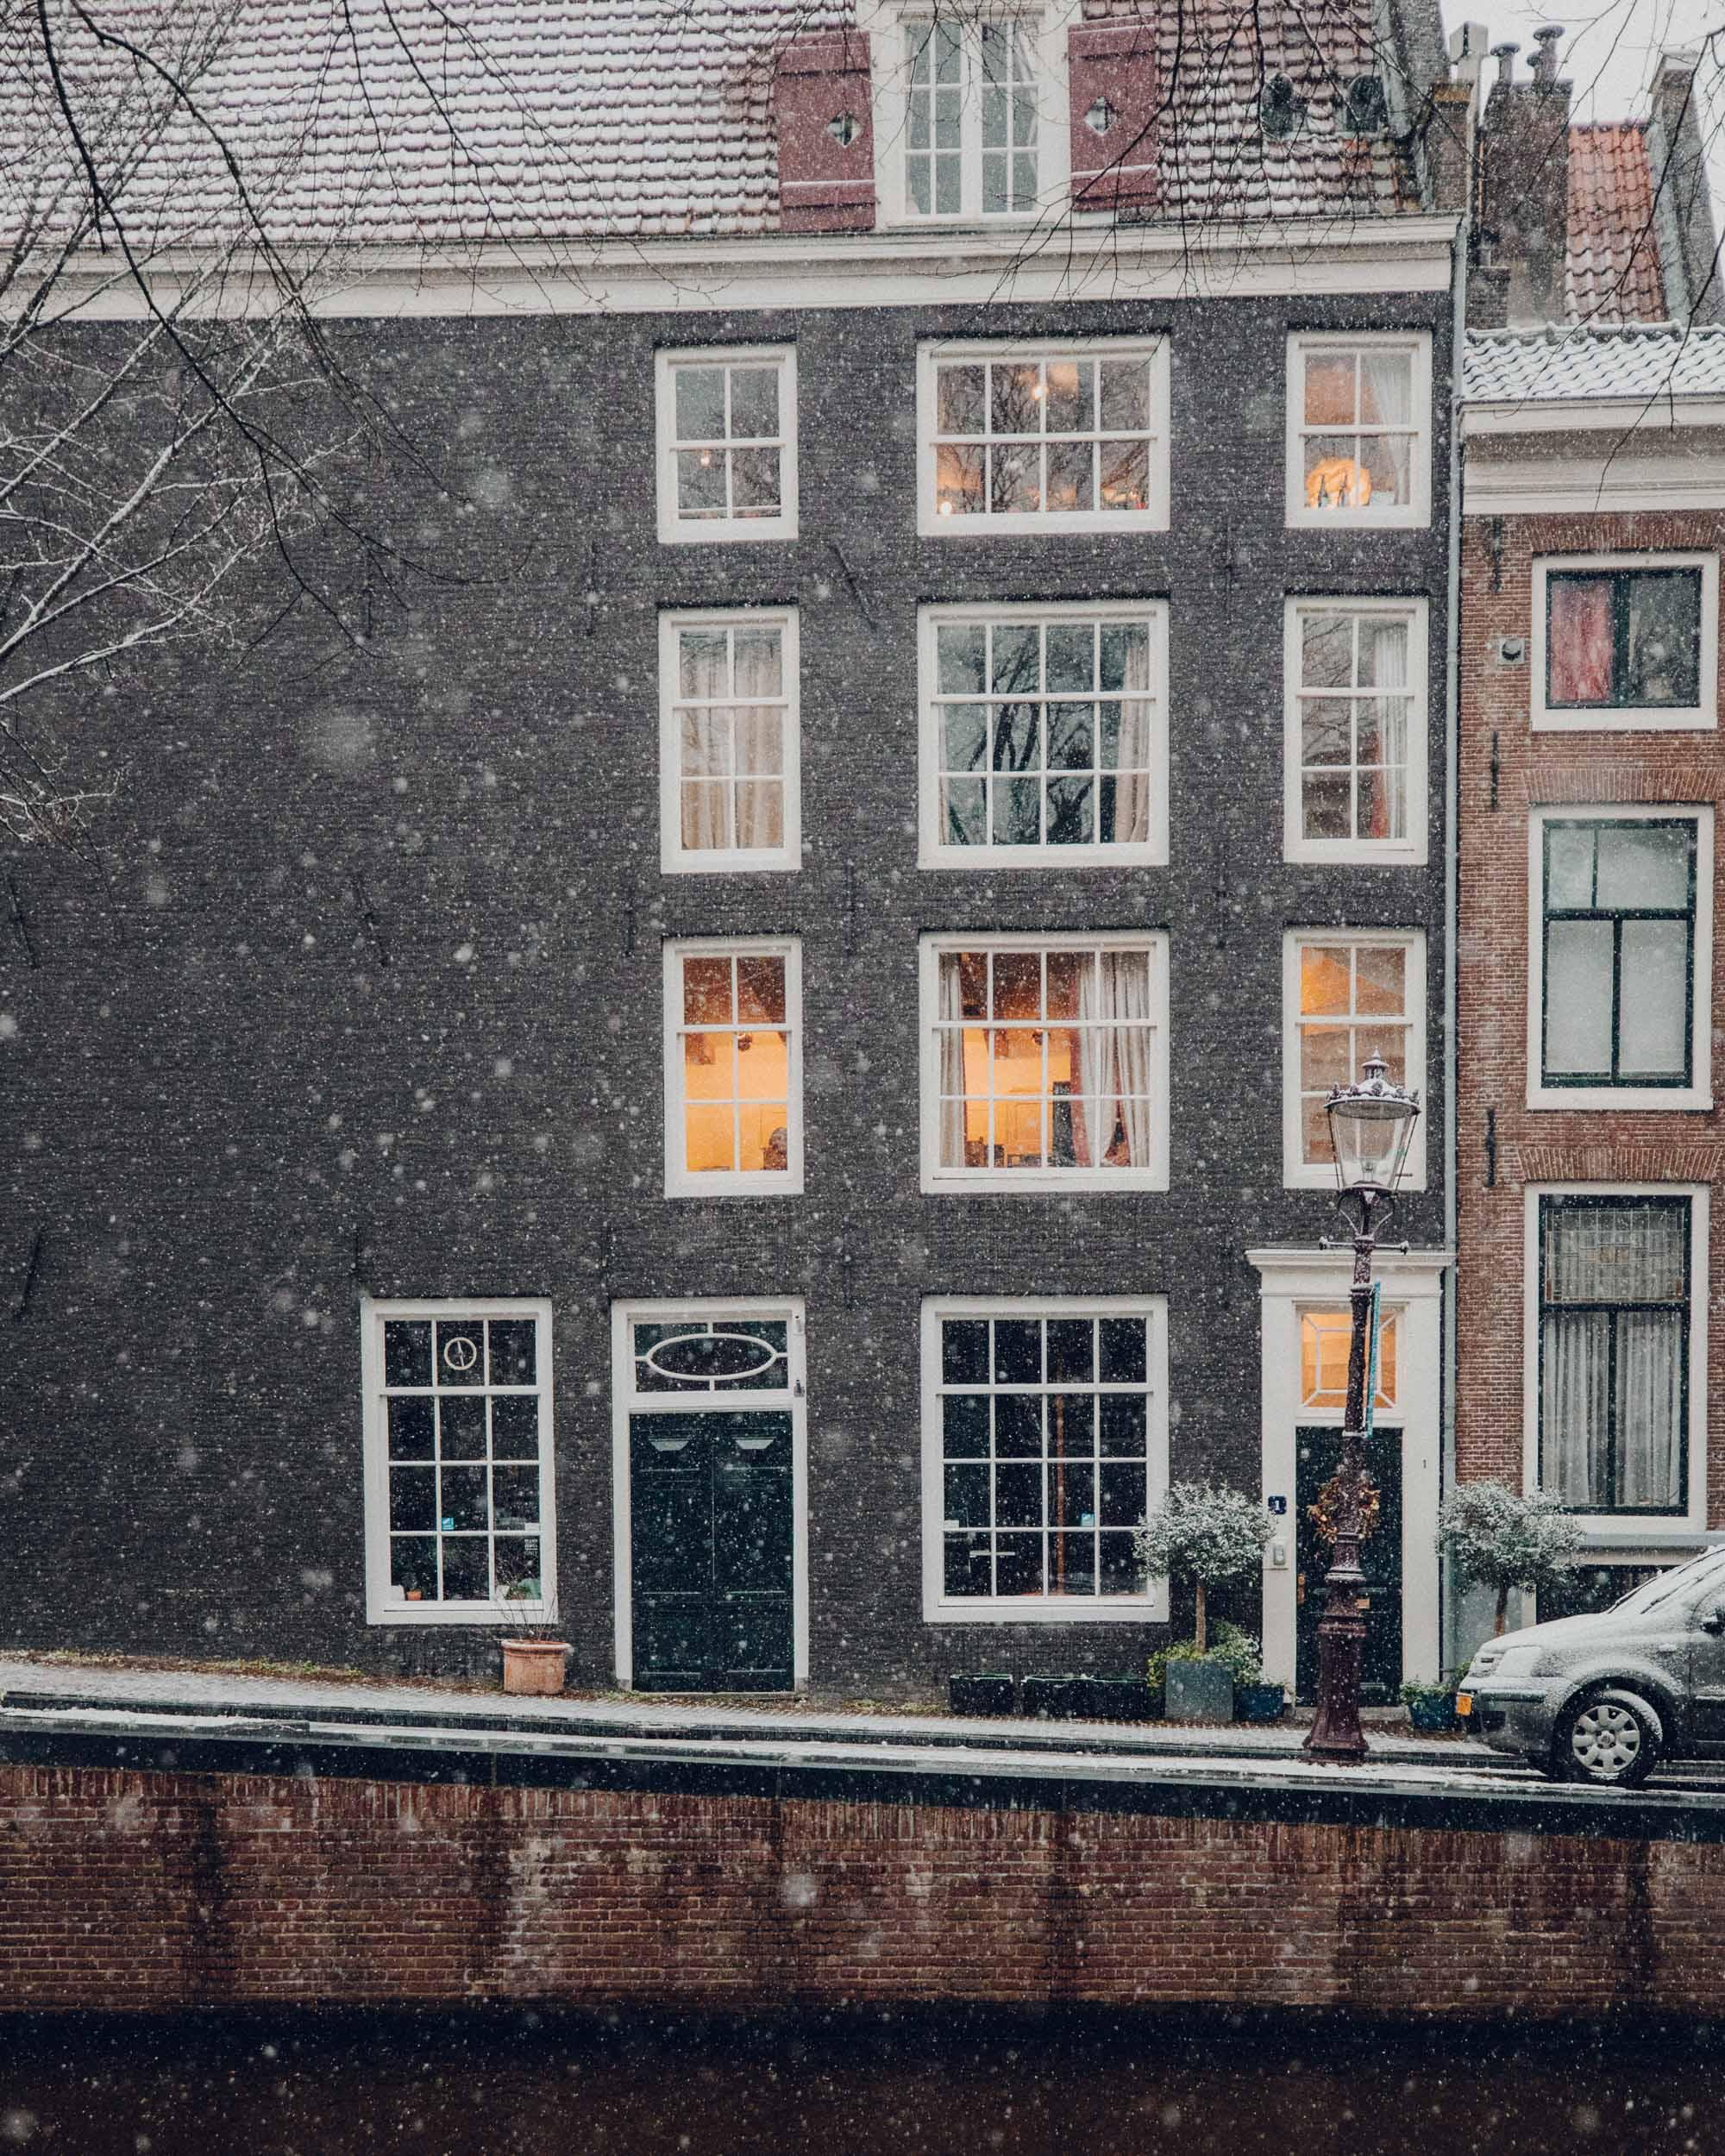 Amsterdam facade in the snow via @finduslost